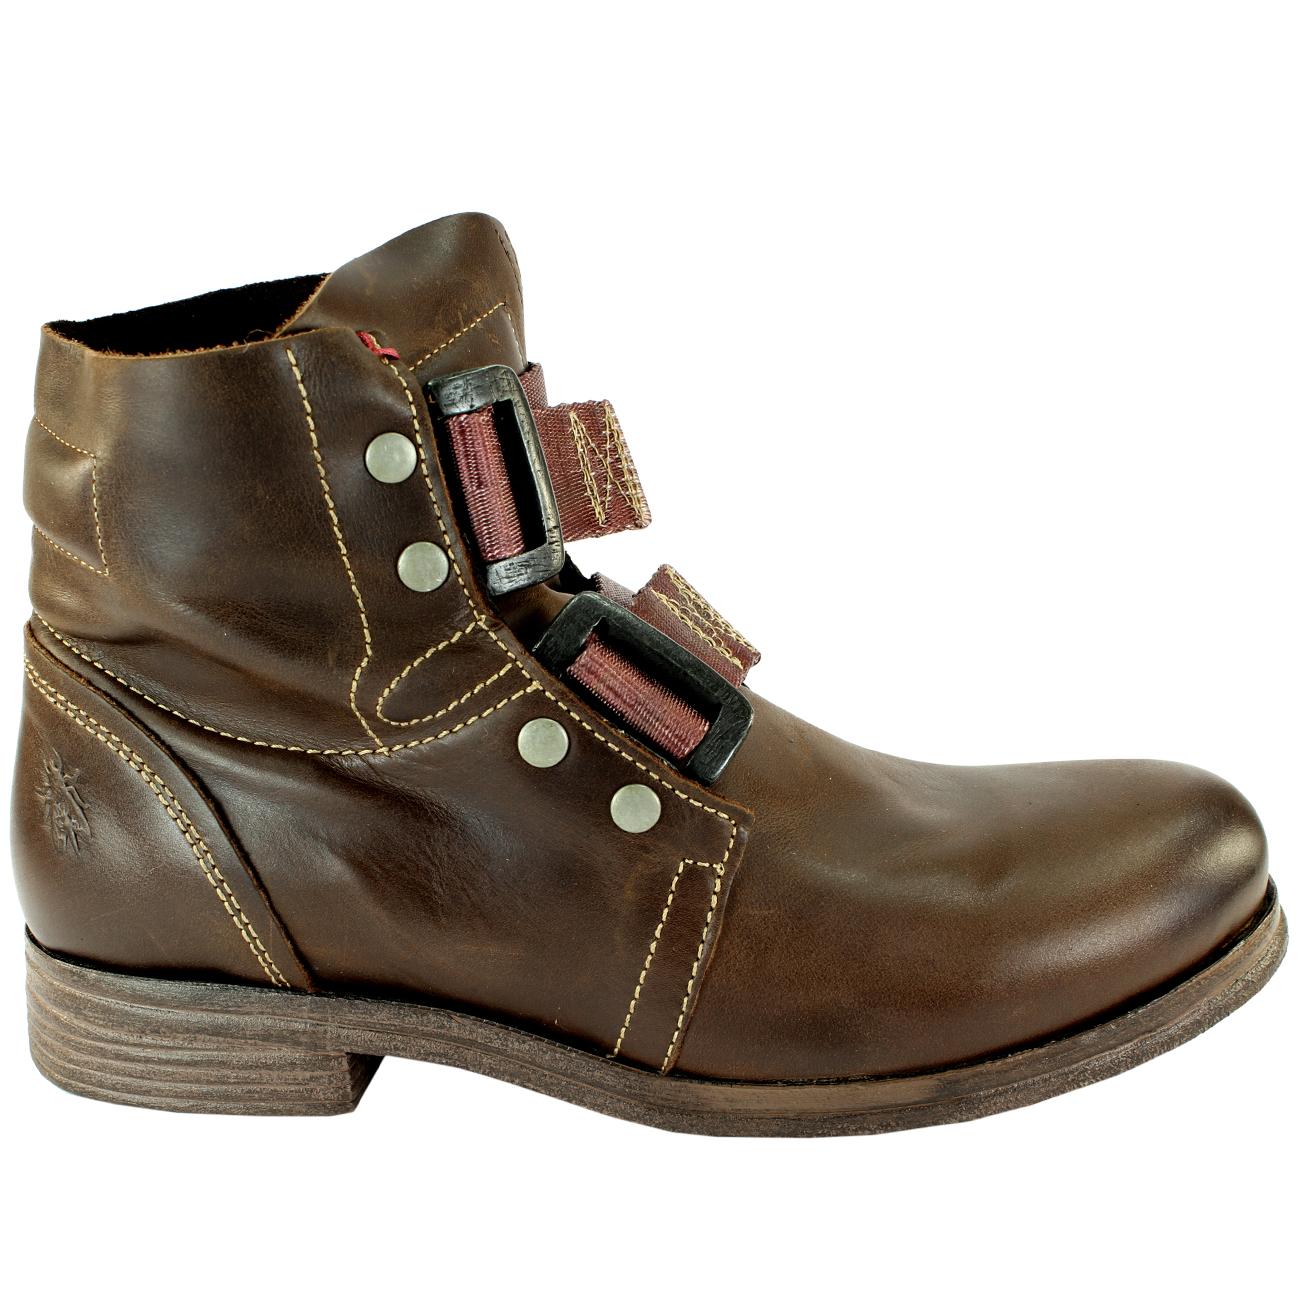 Ska Shoes For Sale